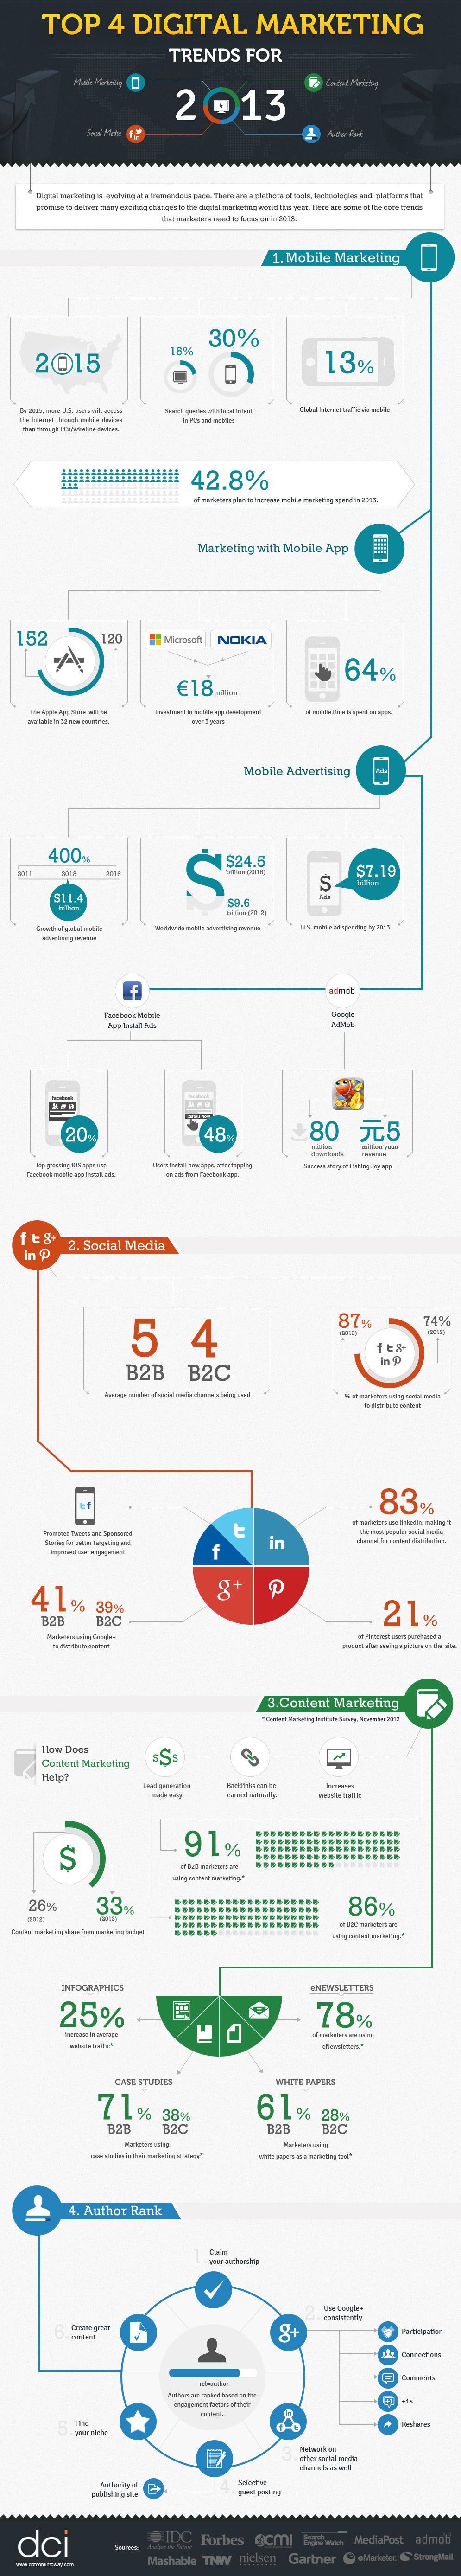 Top 4 Digital Marketing Trends in 2013 : infographic